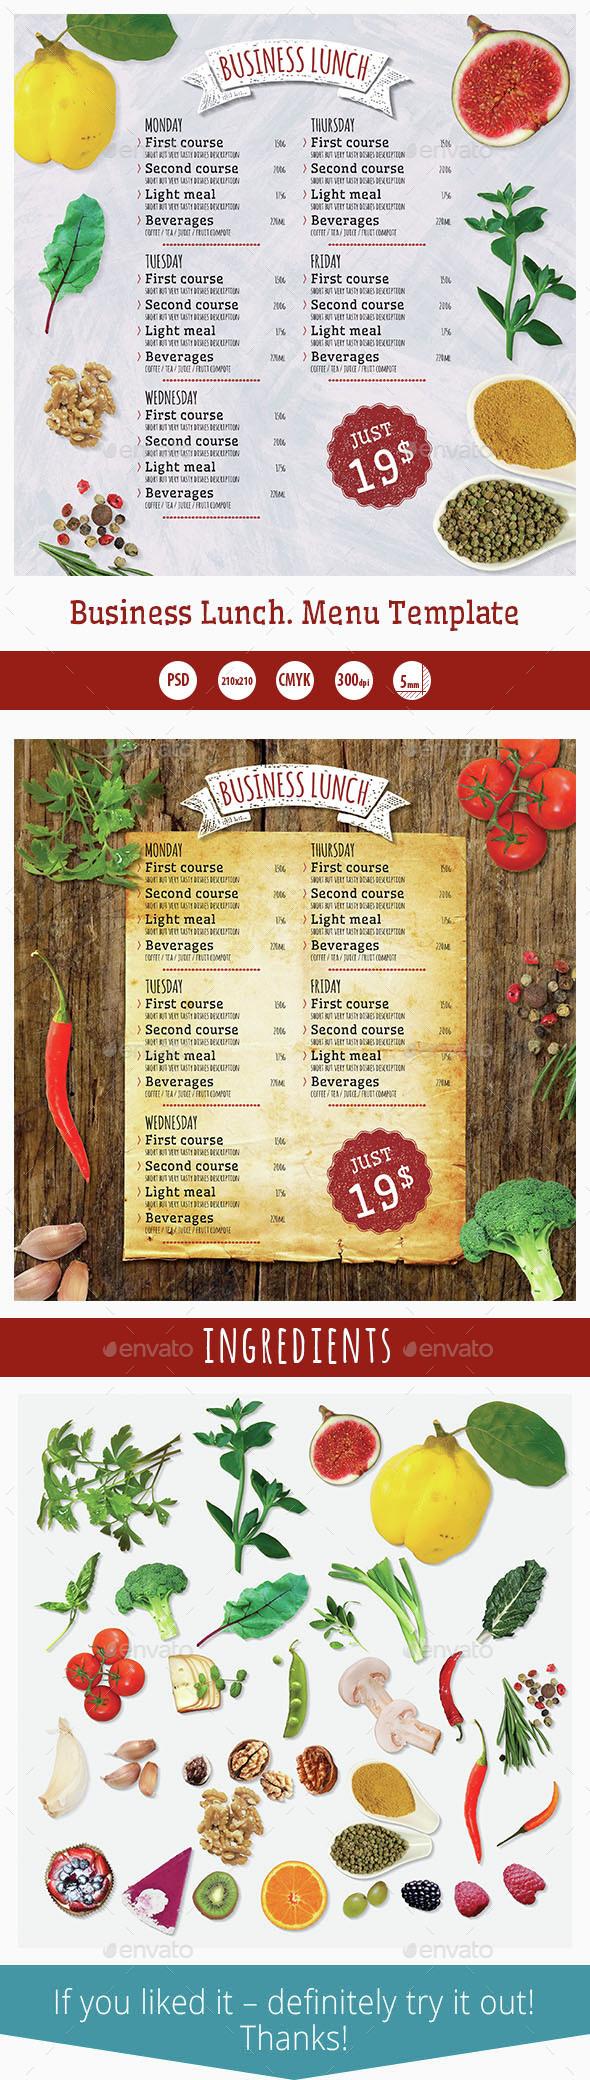 Business Lunch Menu Template - Food Menus Print Templates